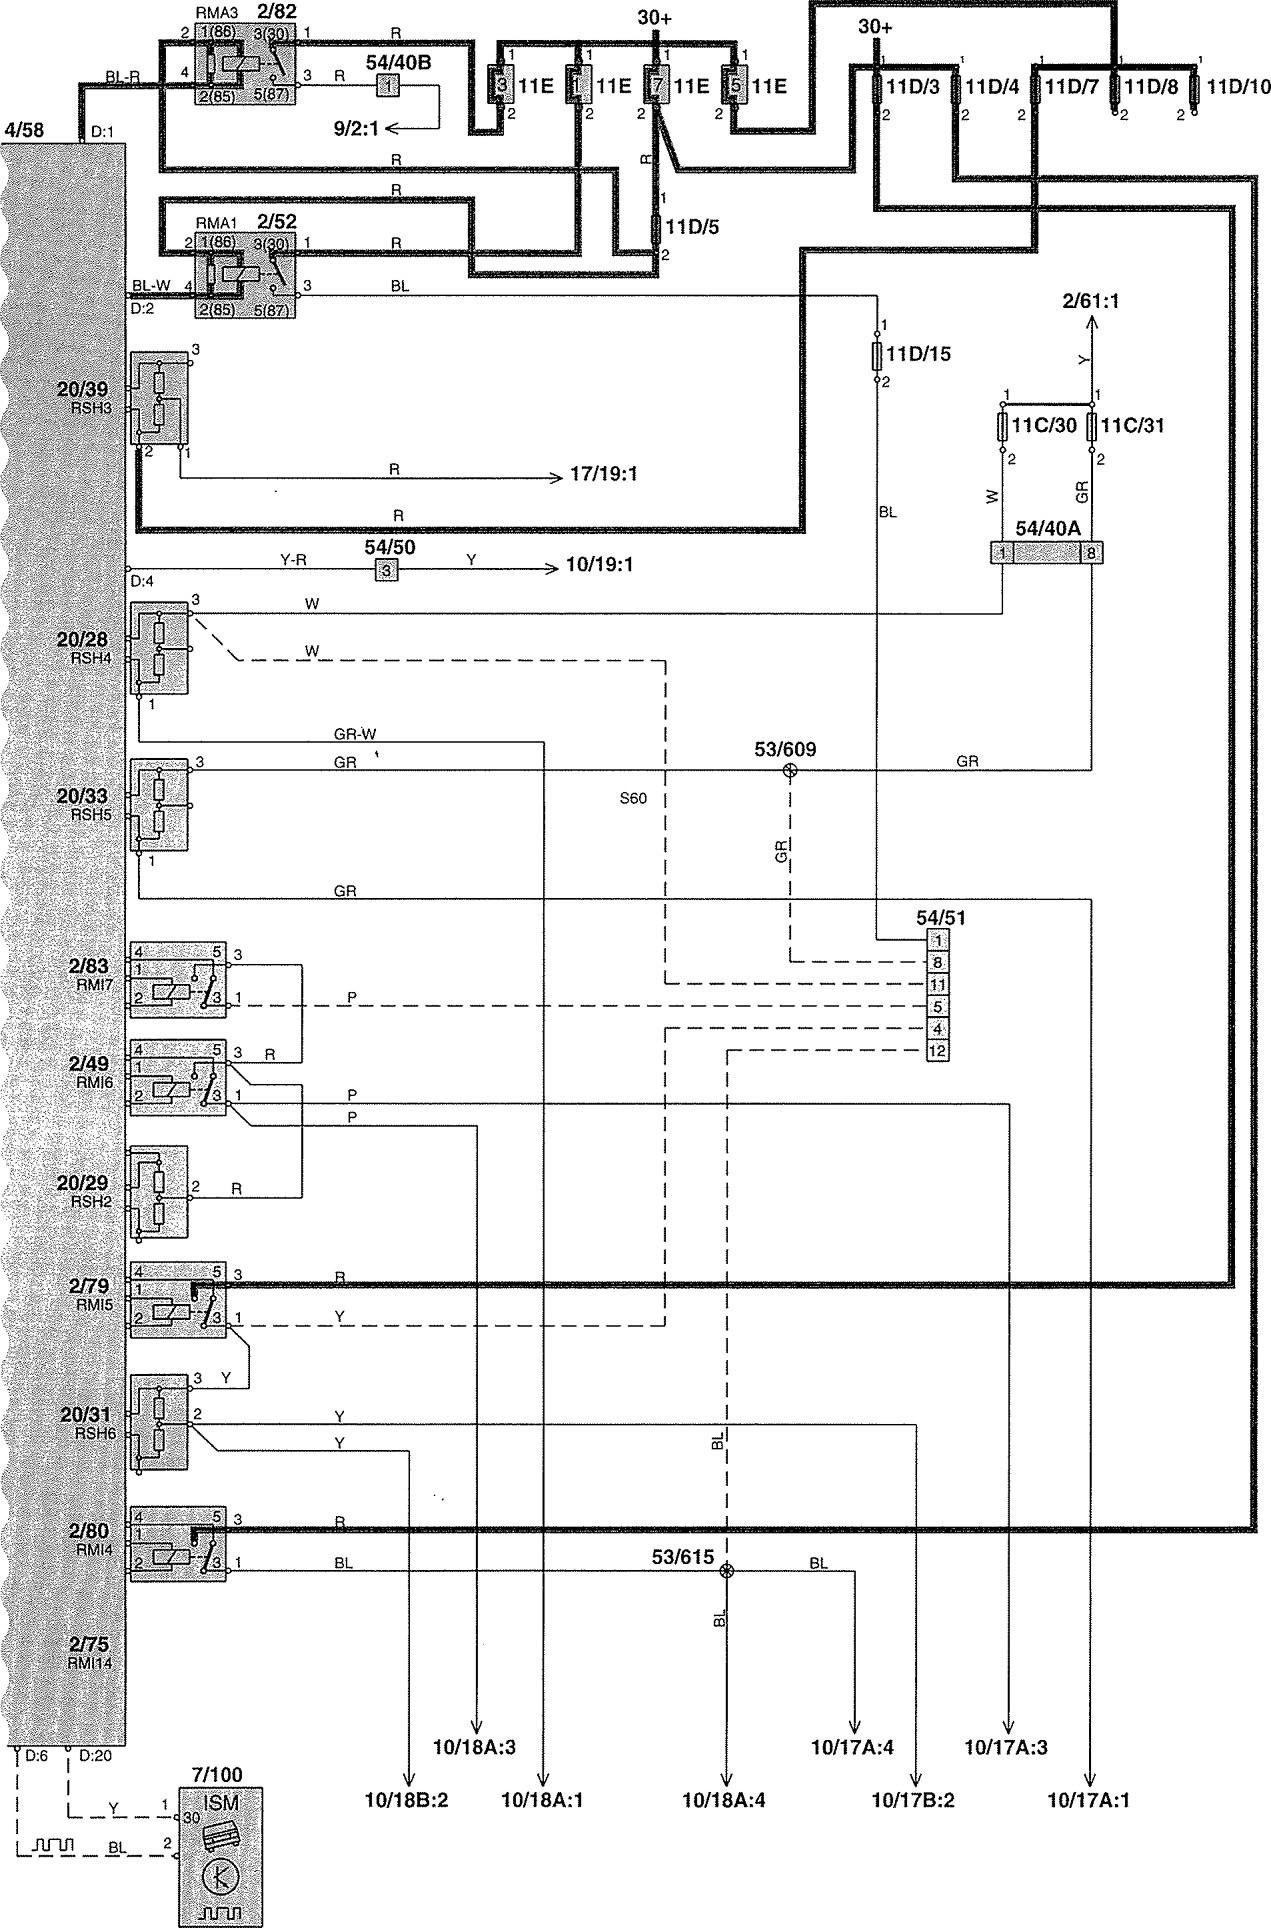 wiring diagram volvo p1800 volvo v70 electrical diagram wire diagrams rh maerkang org 1966 volvo p1800 wiring diagram 1972 volvo p1800 wiring diagram